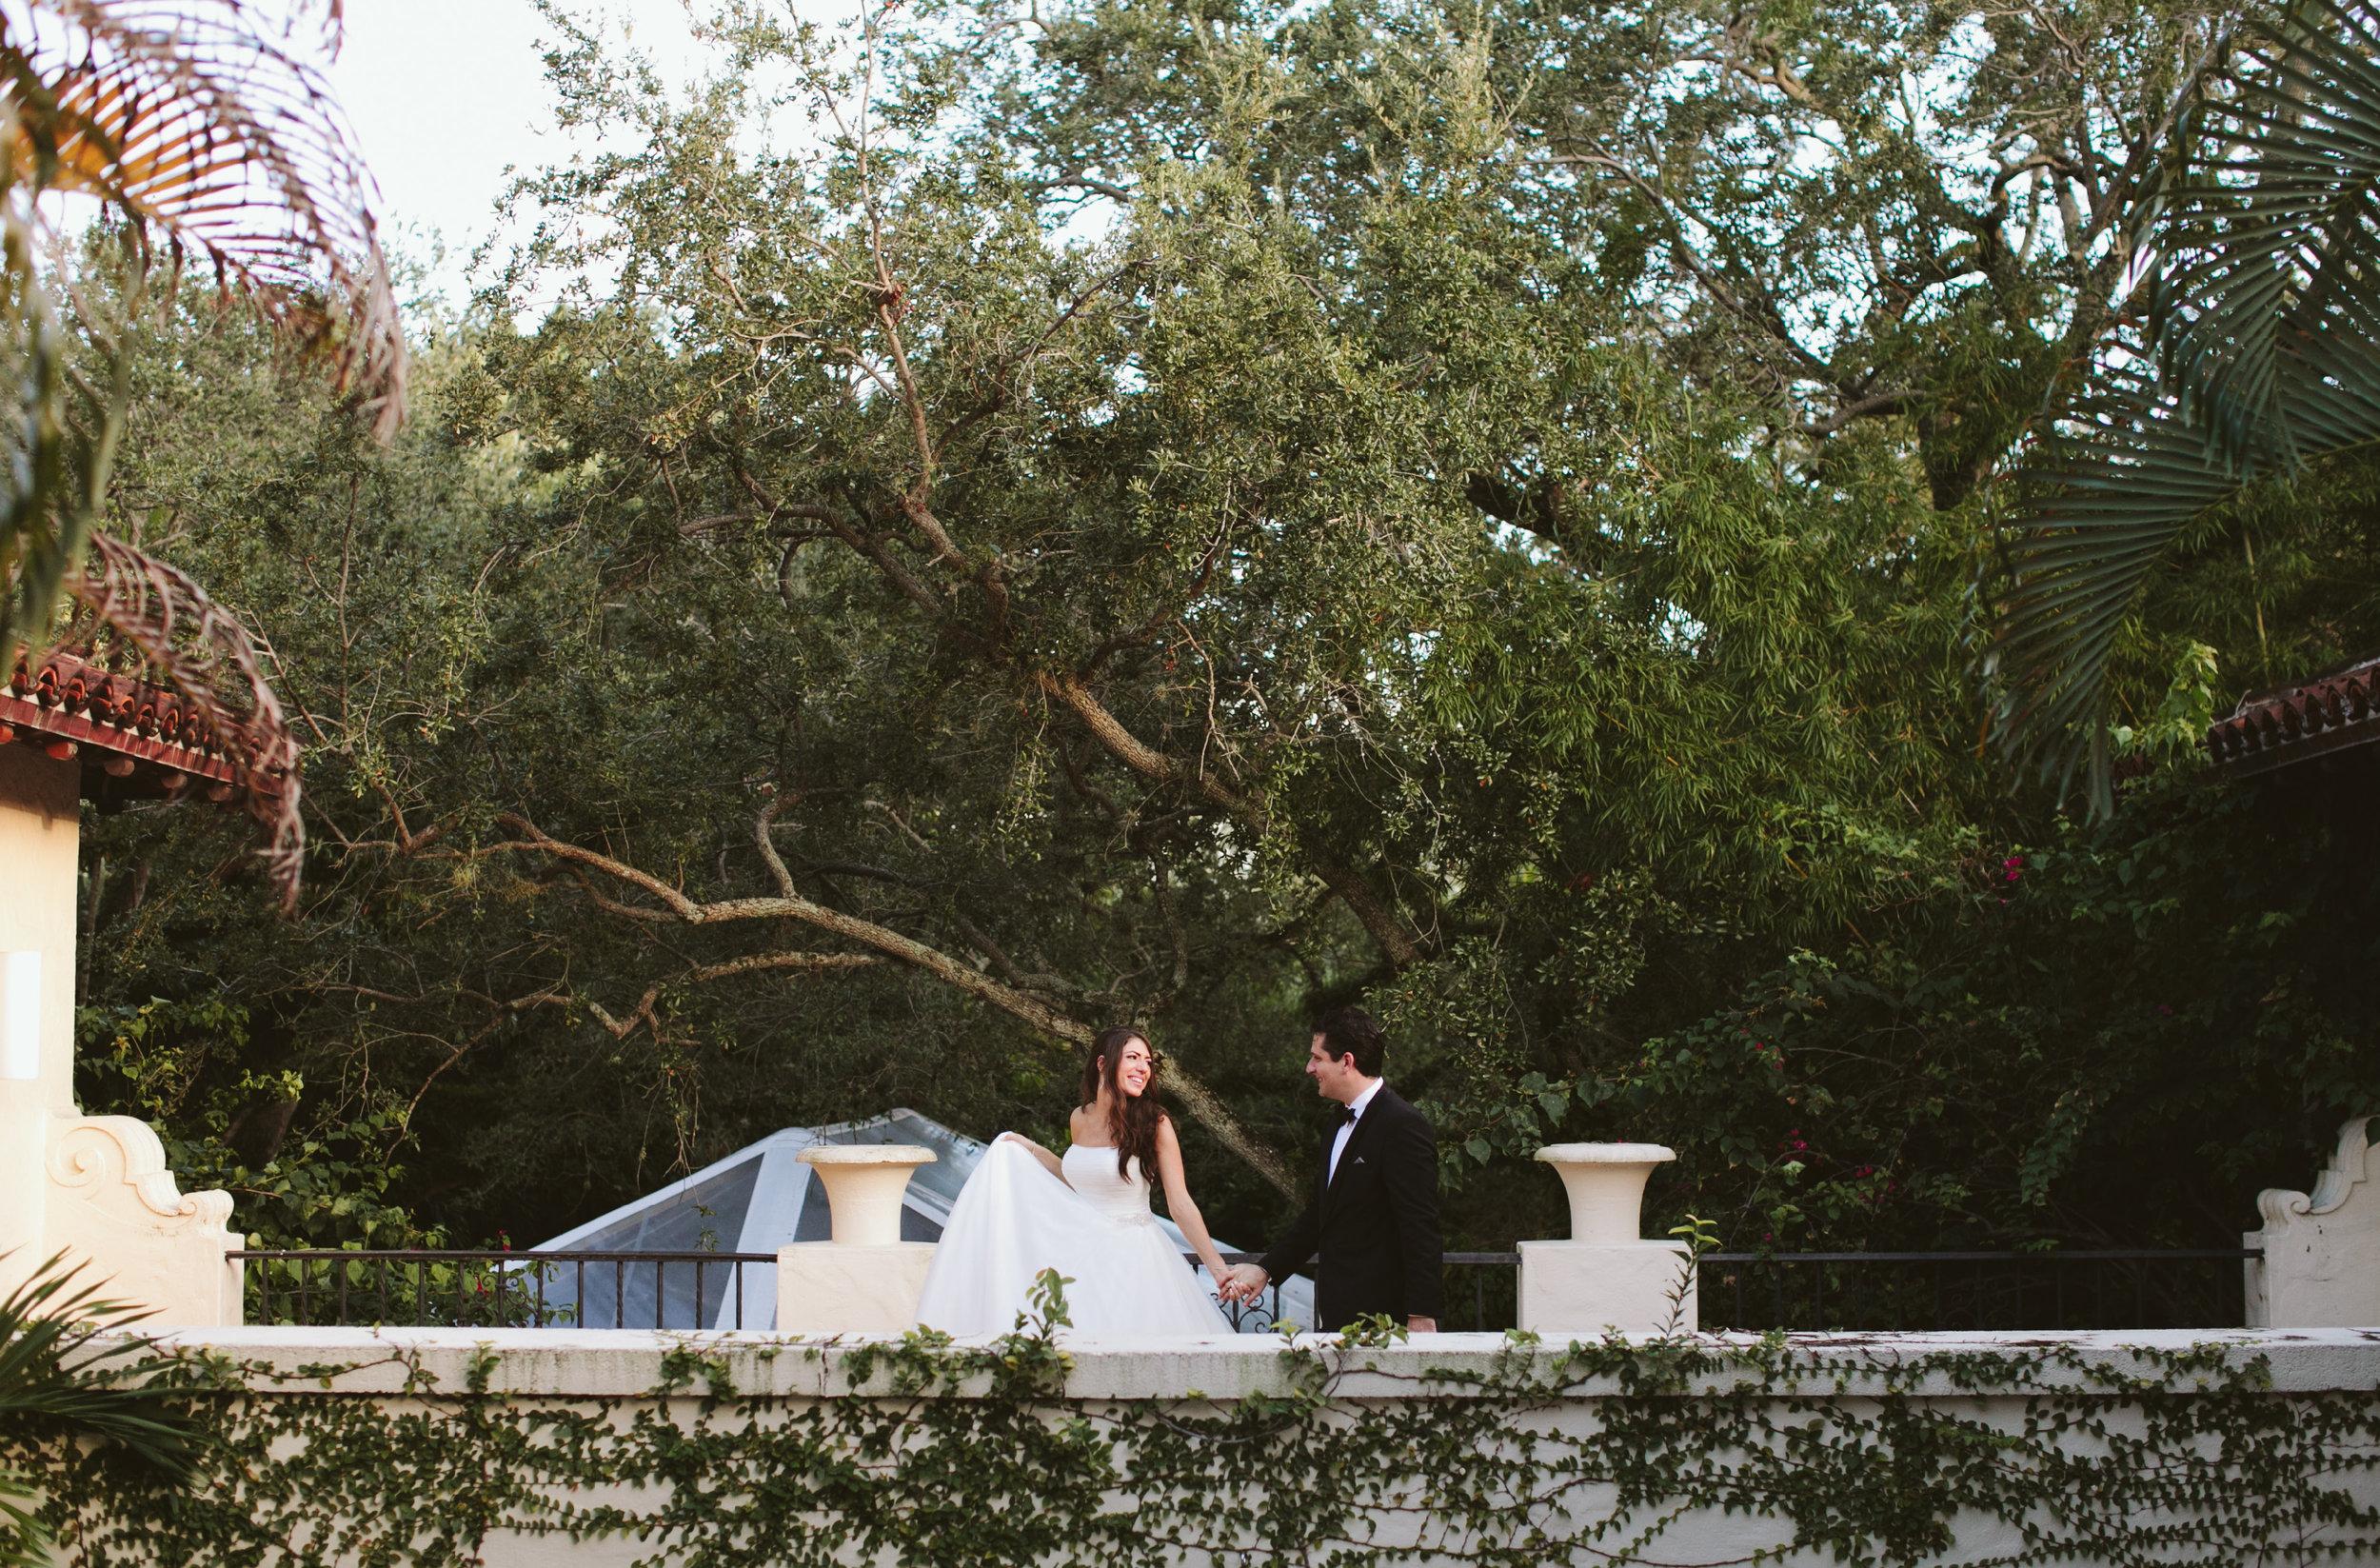 Meli + Mike Coconut Grove Wedding at Villa Woodbine37.jpg